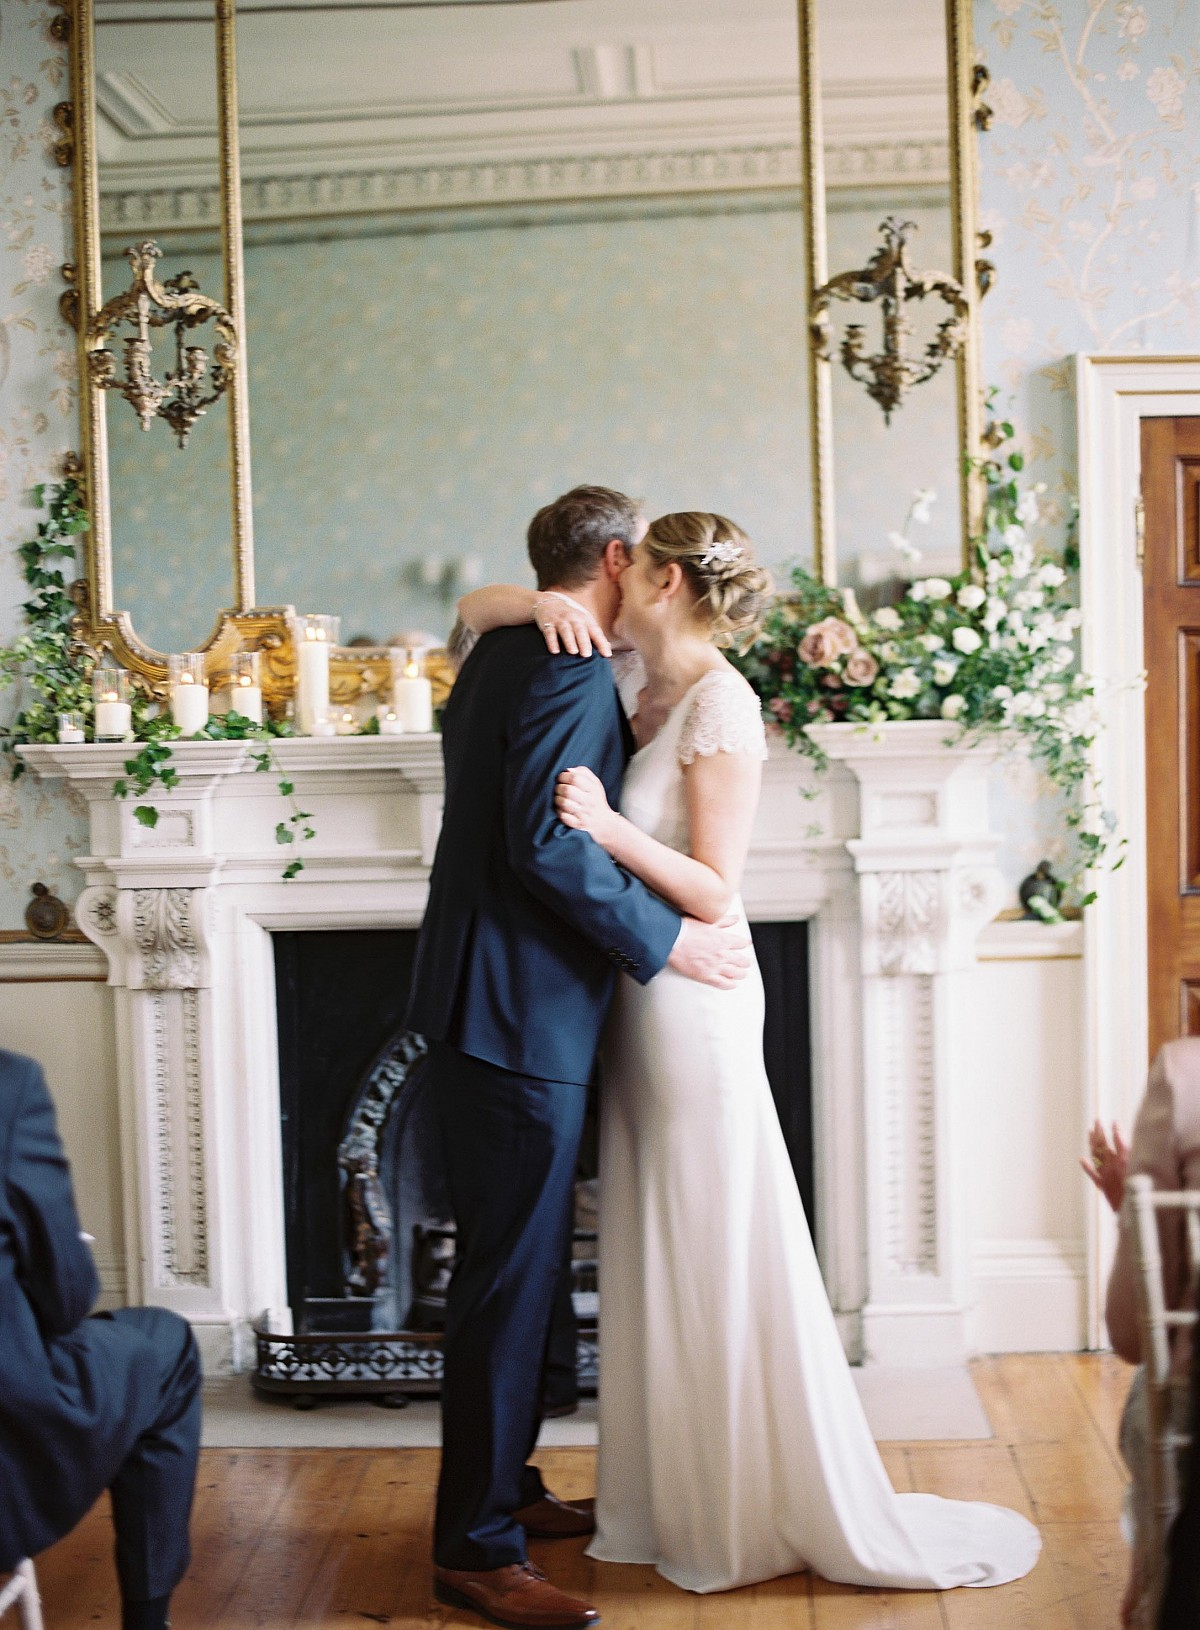 Abi and Chris' Intentional, Minimal Devon Wedding